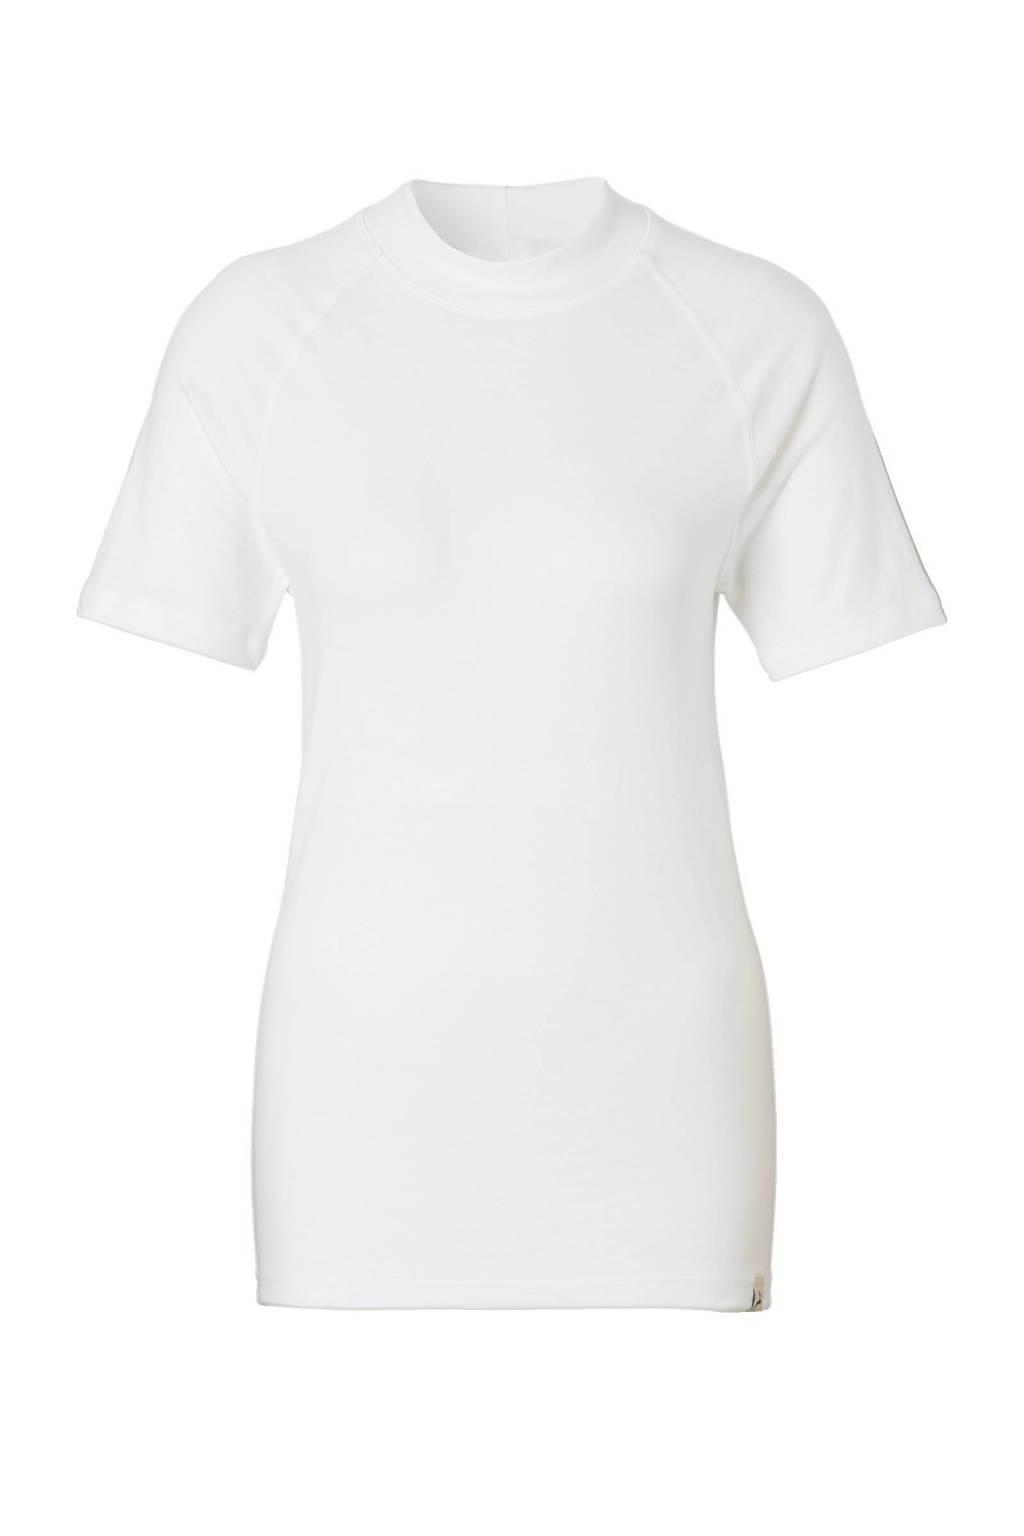 ten Cate thermo T-shirt wit, Ecru